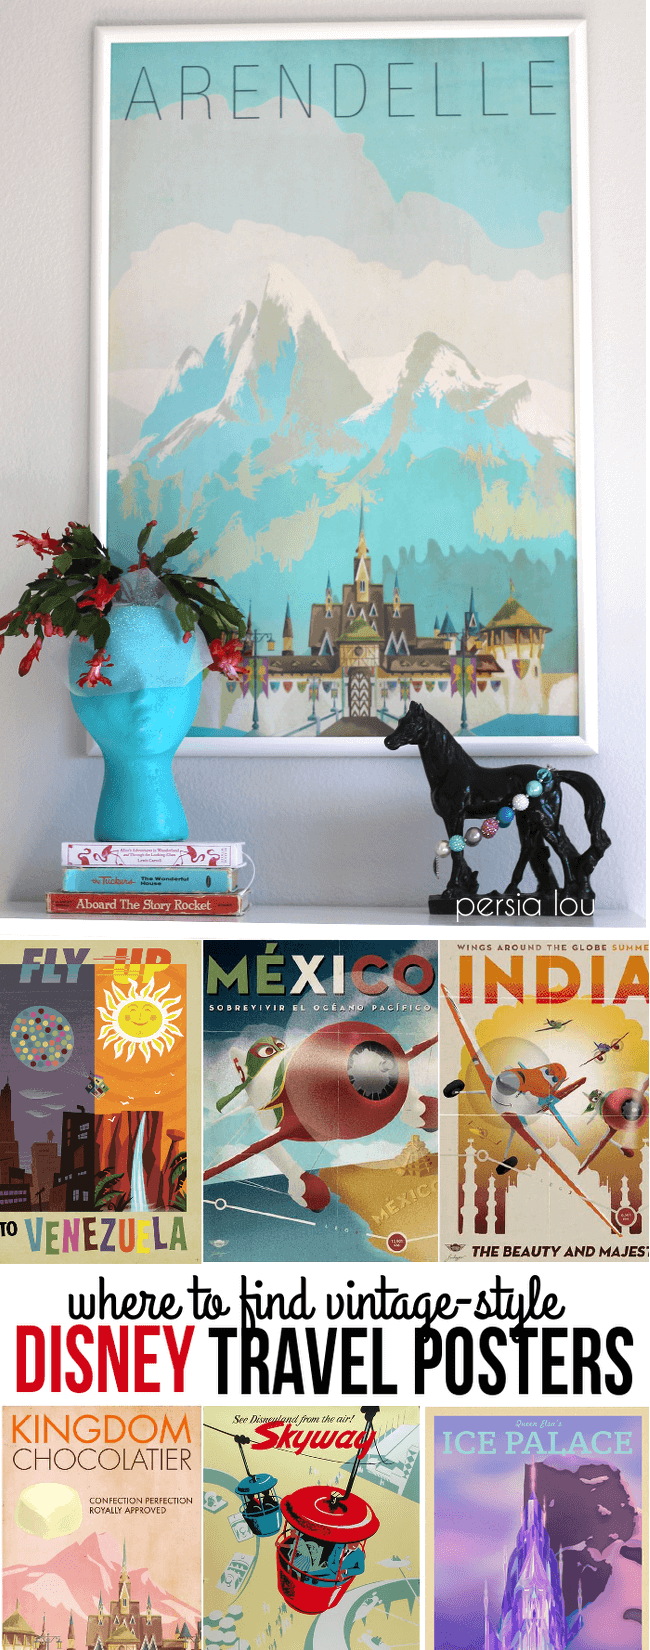 where to find vintage style disney travel posters. Black Bedroom Furniture Sets. Home Design Ideas